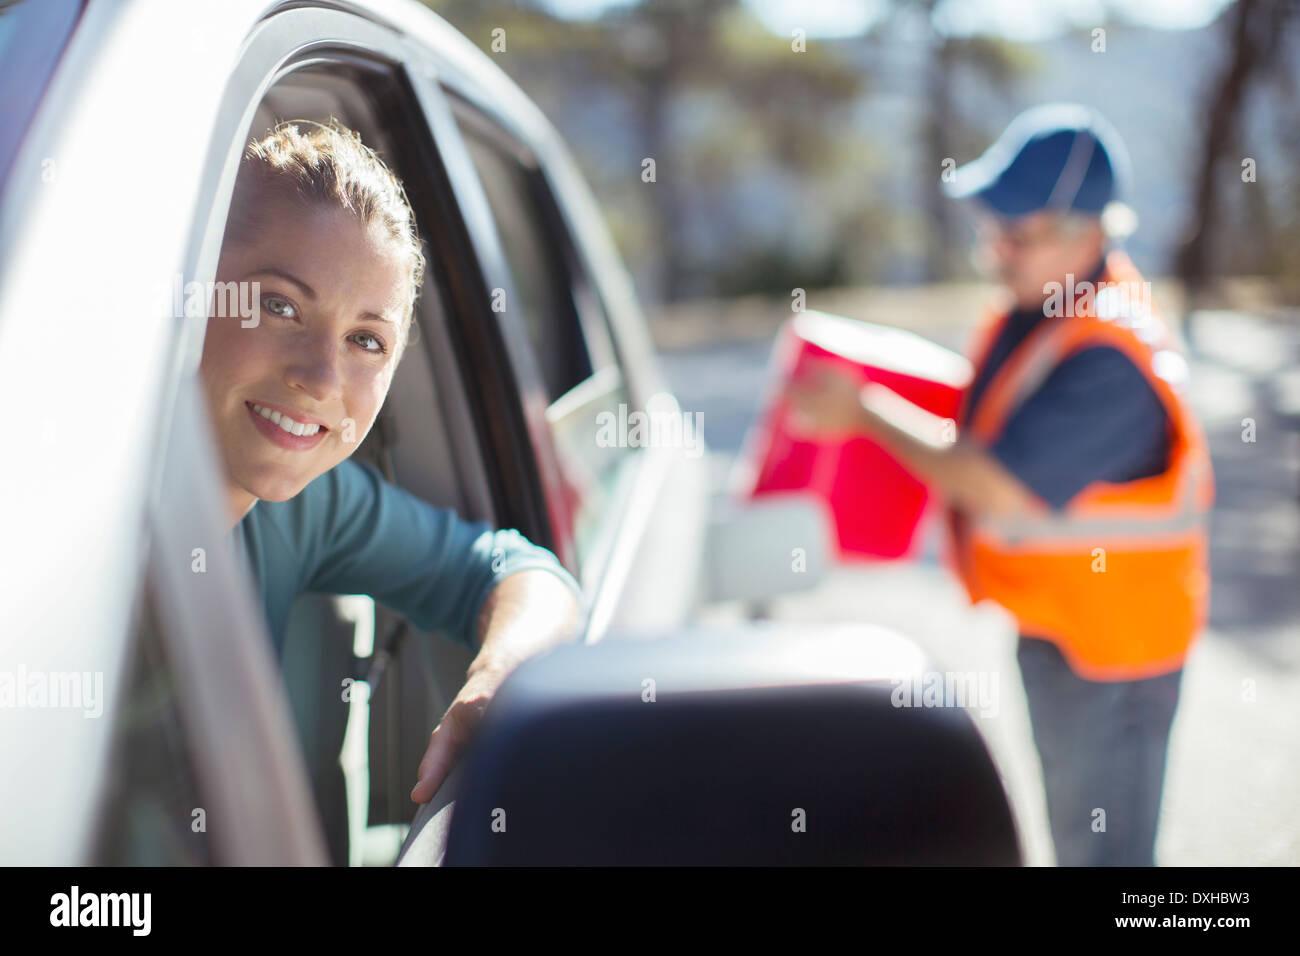 Roadside mechanic filling gas tank for woman - Stock Image